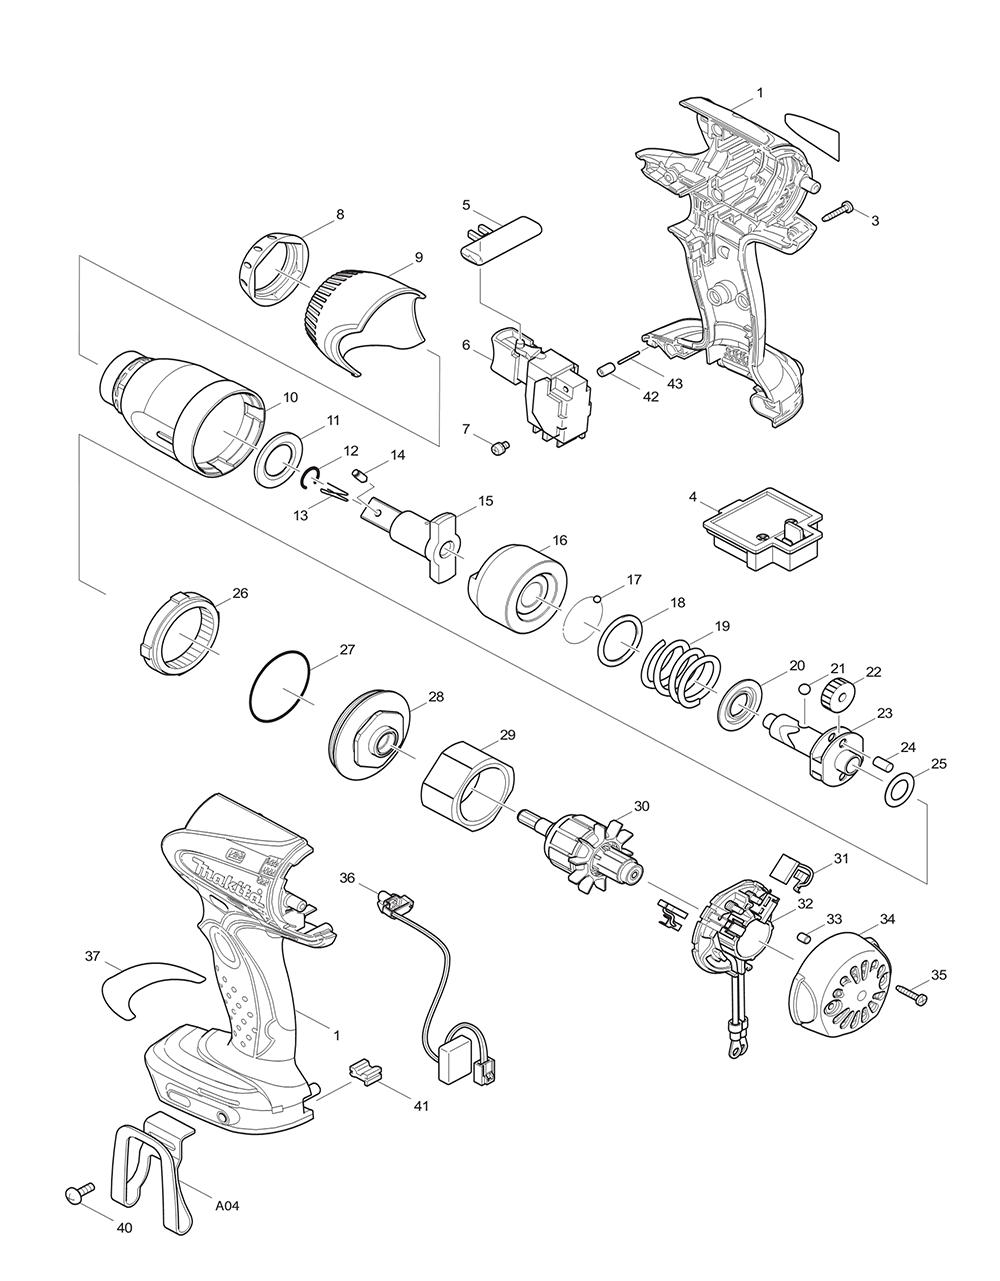 Makita hr2475 switch wiring diagram